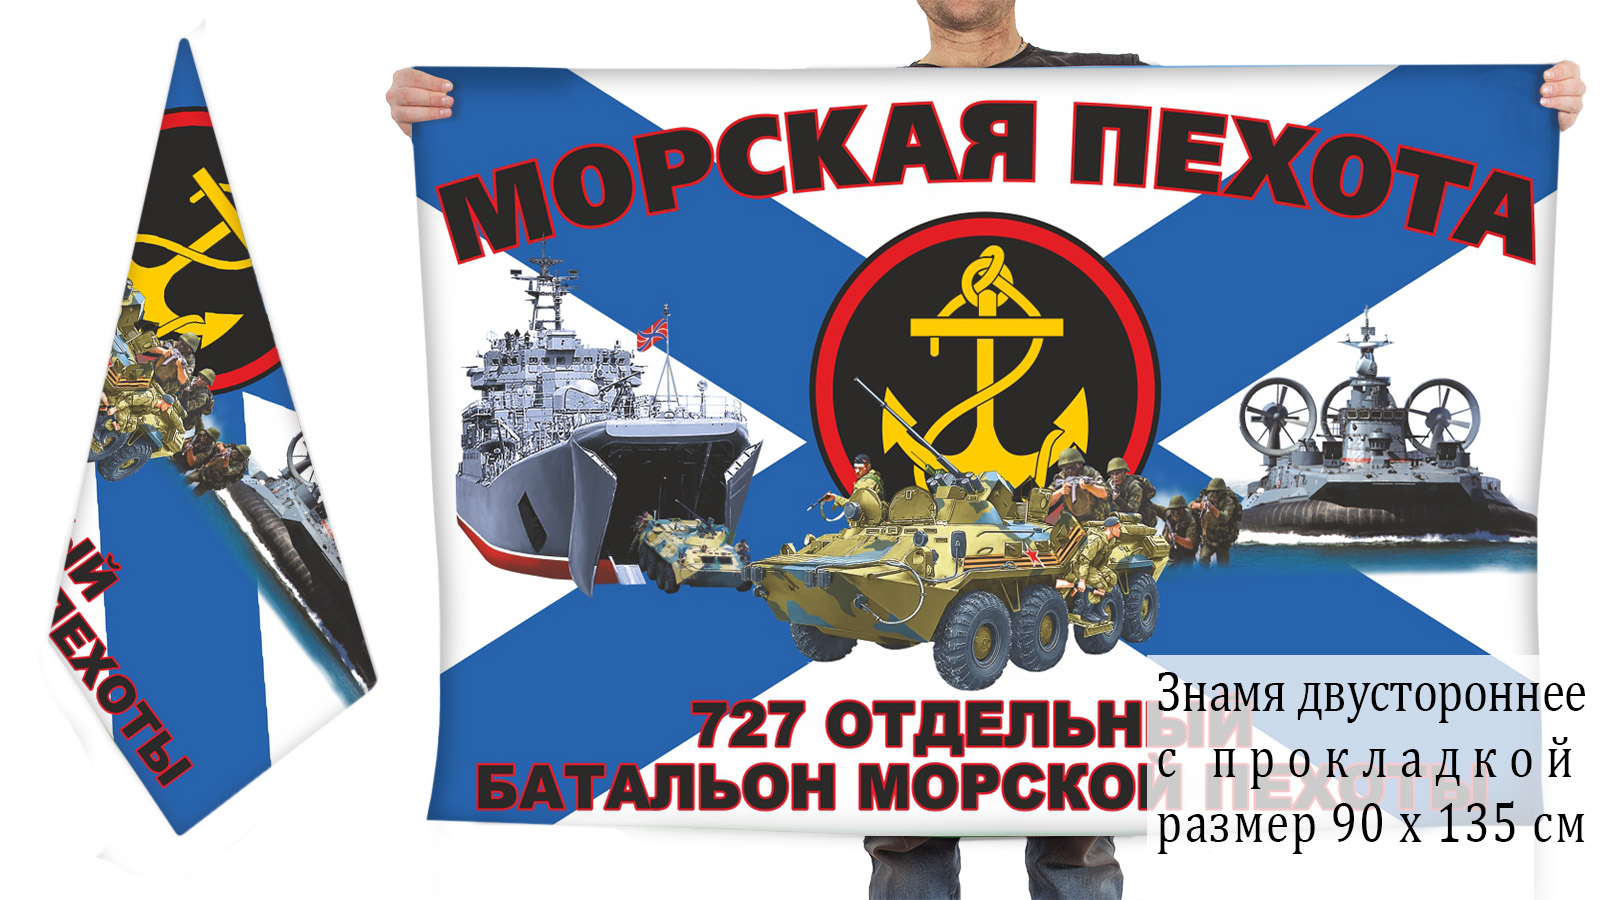 Двусторонний флаг 727 отдельного батальона морпехов